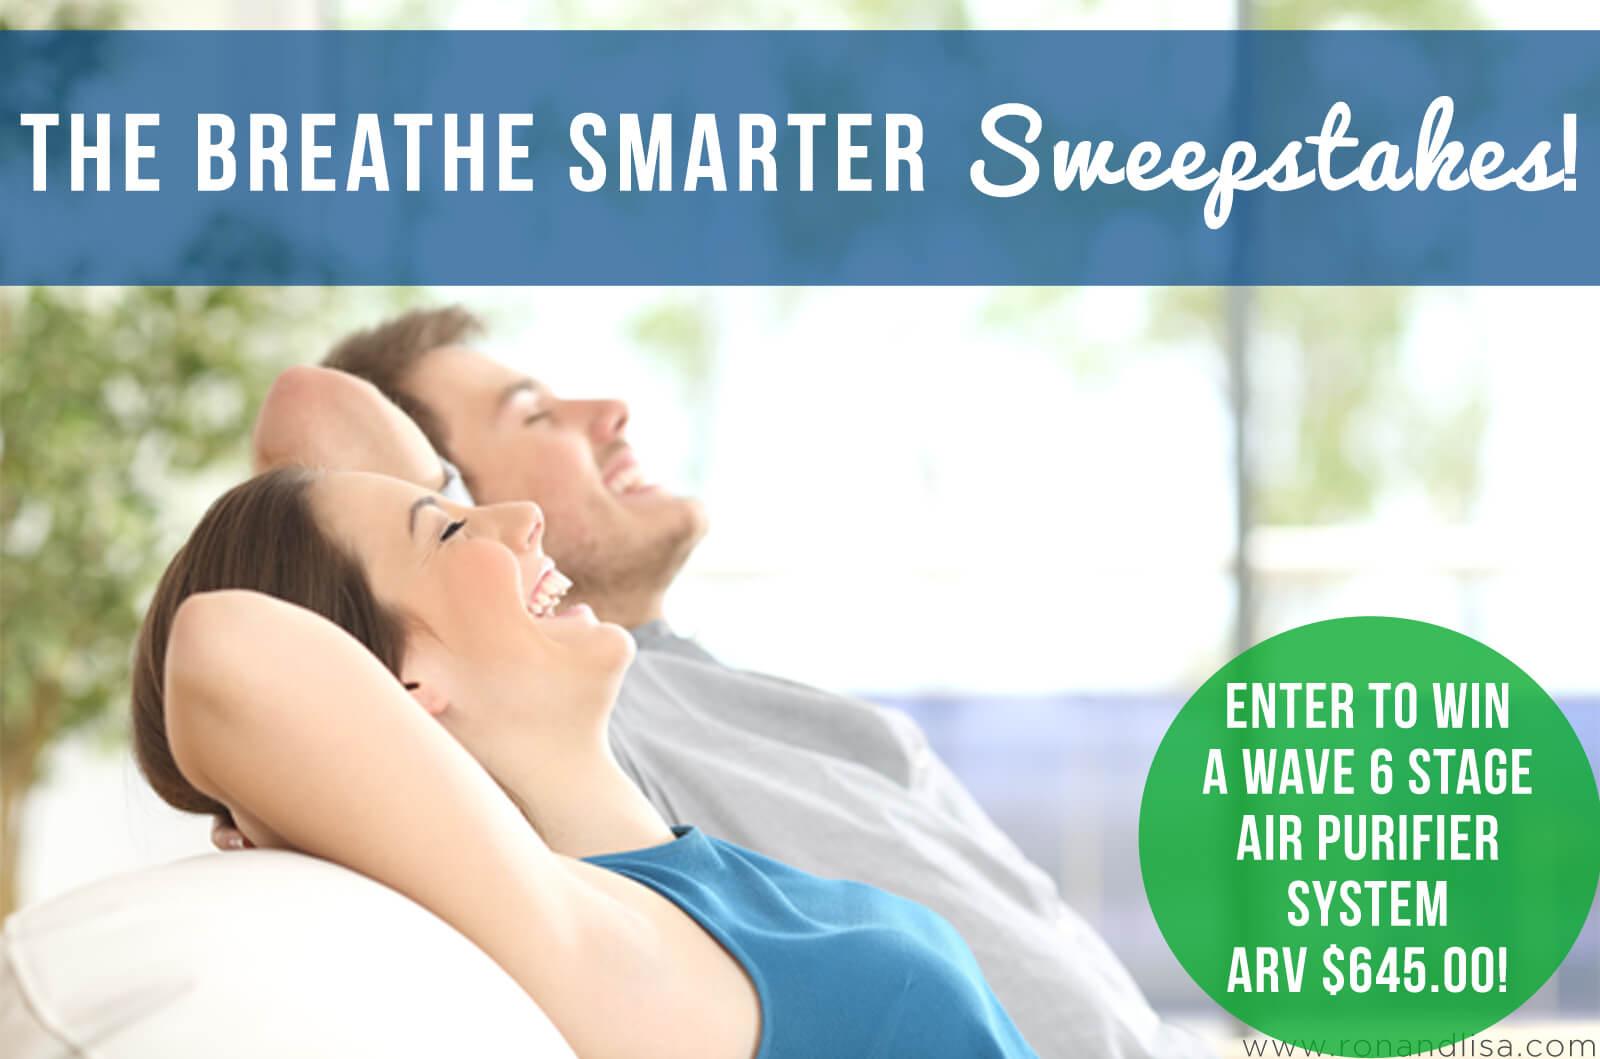 The Breathe Smarter Sweepstakes